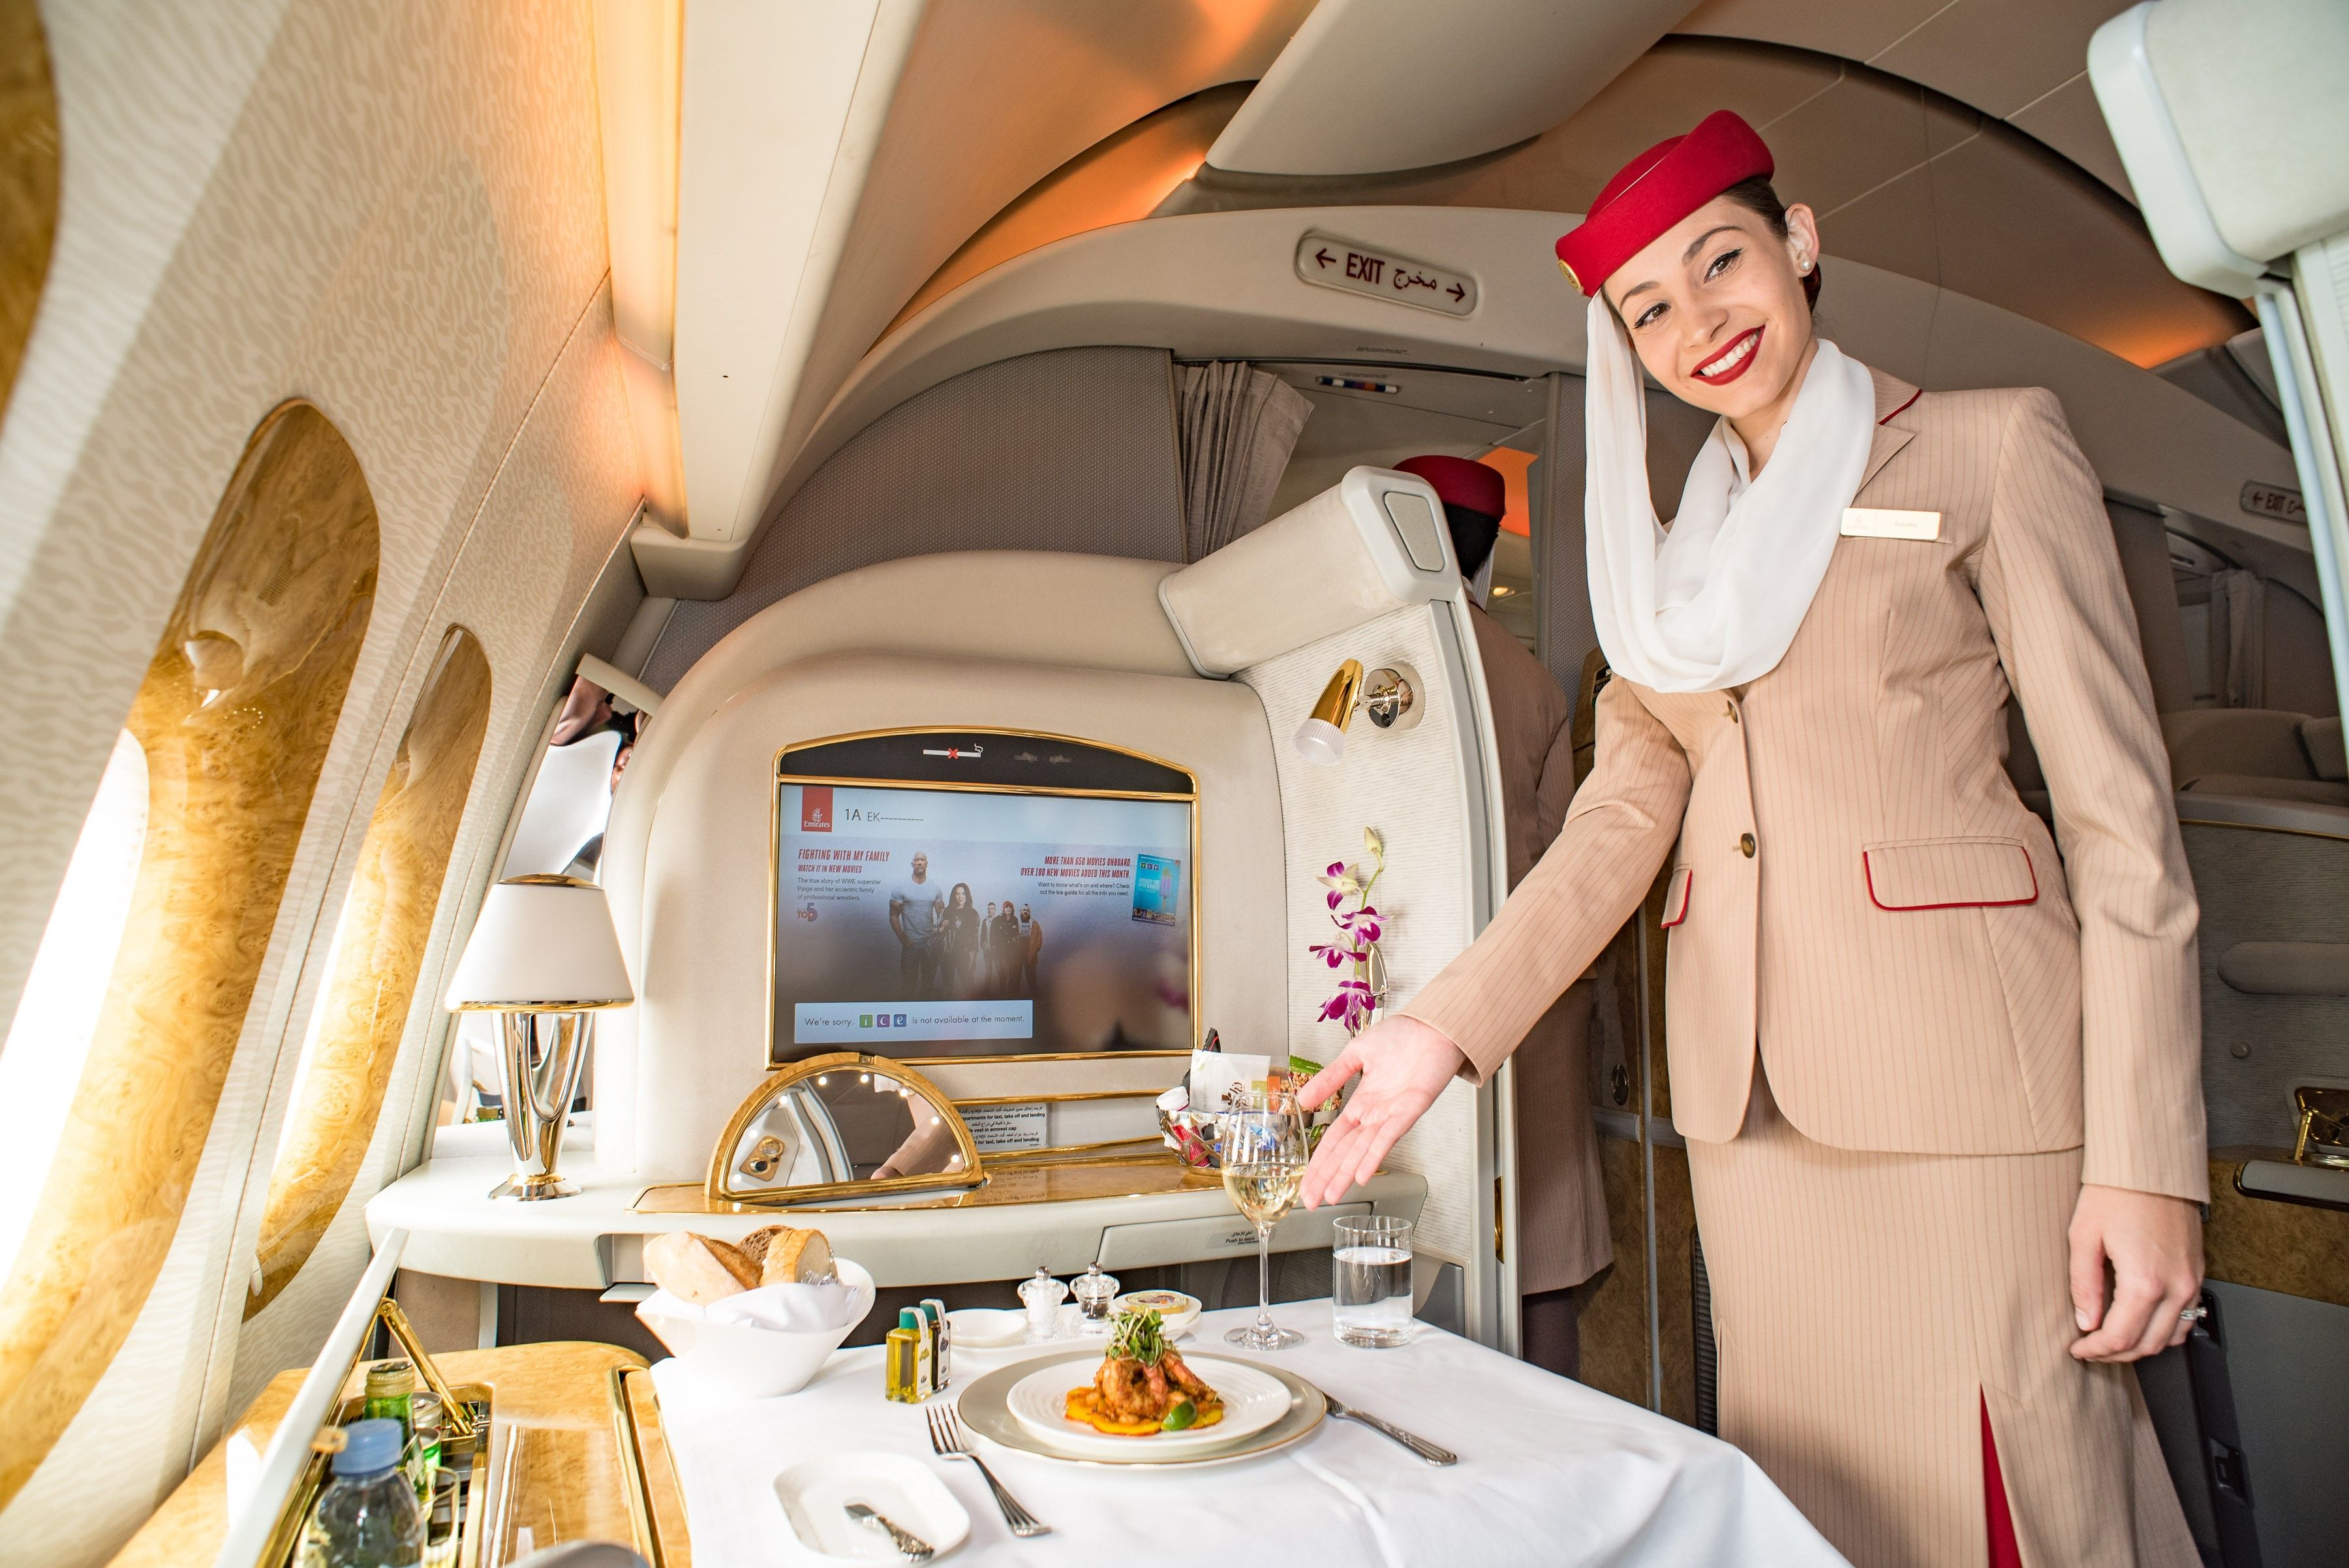 Emirates Passenger Self Upgrades To First Class Assaults And